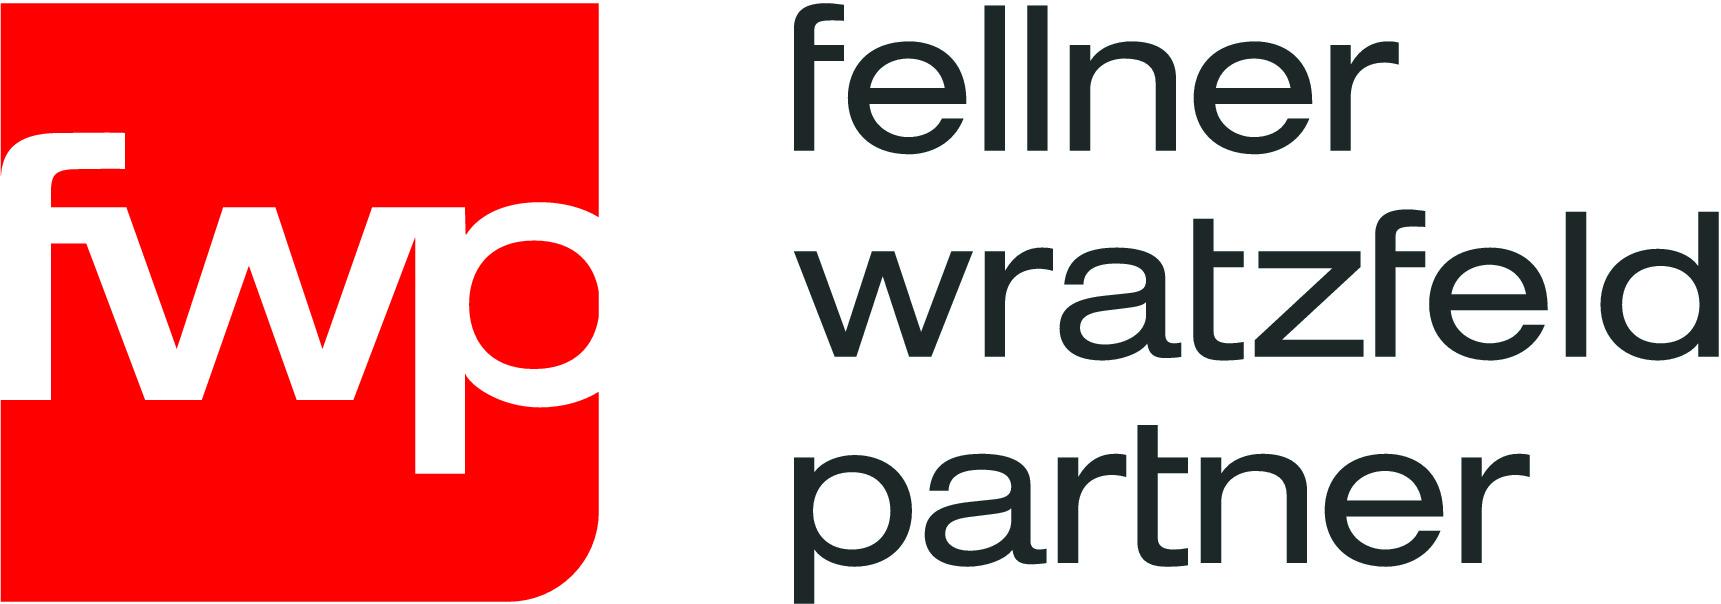 Fellner Wratzfeld & Partner Rechtsanwälte GmbH